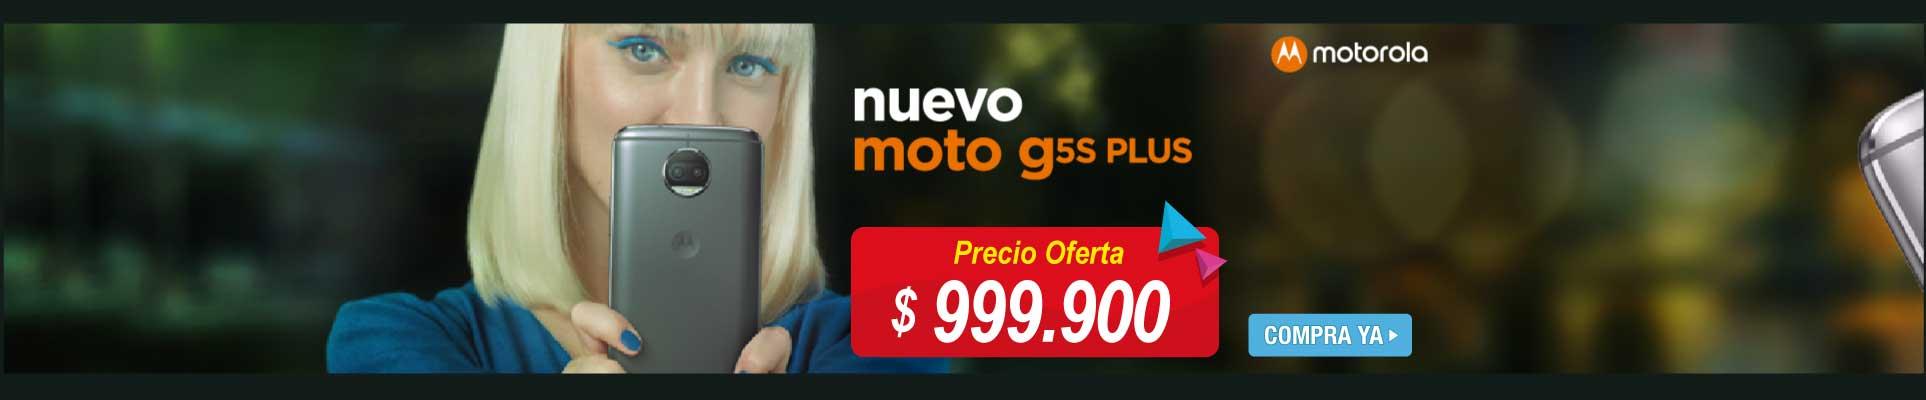 PPAL ALKP-4-celulares-Celular Libre MOTOROLA Moto G5S Plus DS-prod-octubre17-20